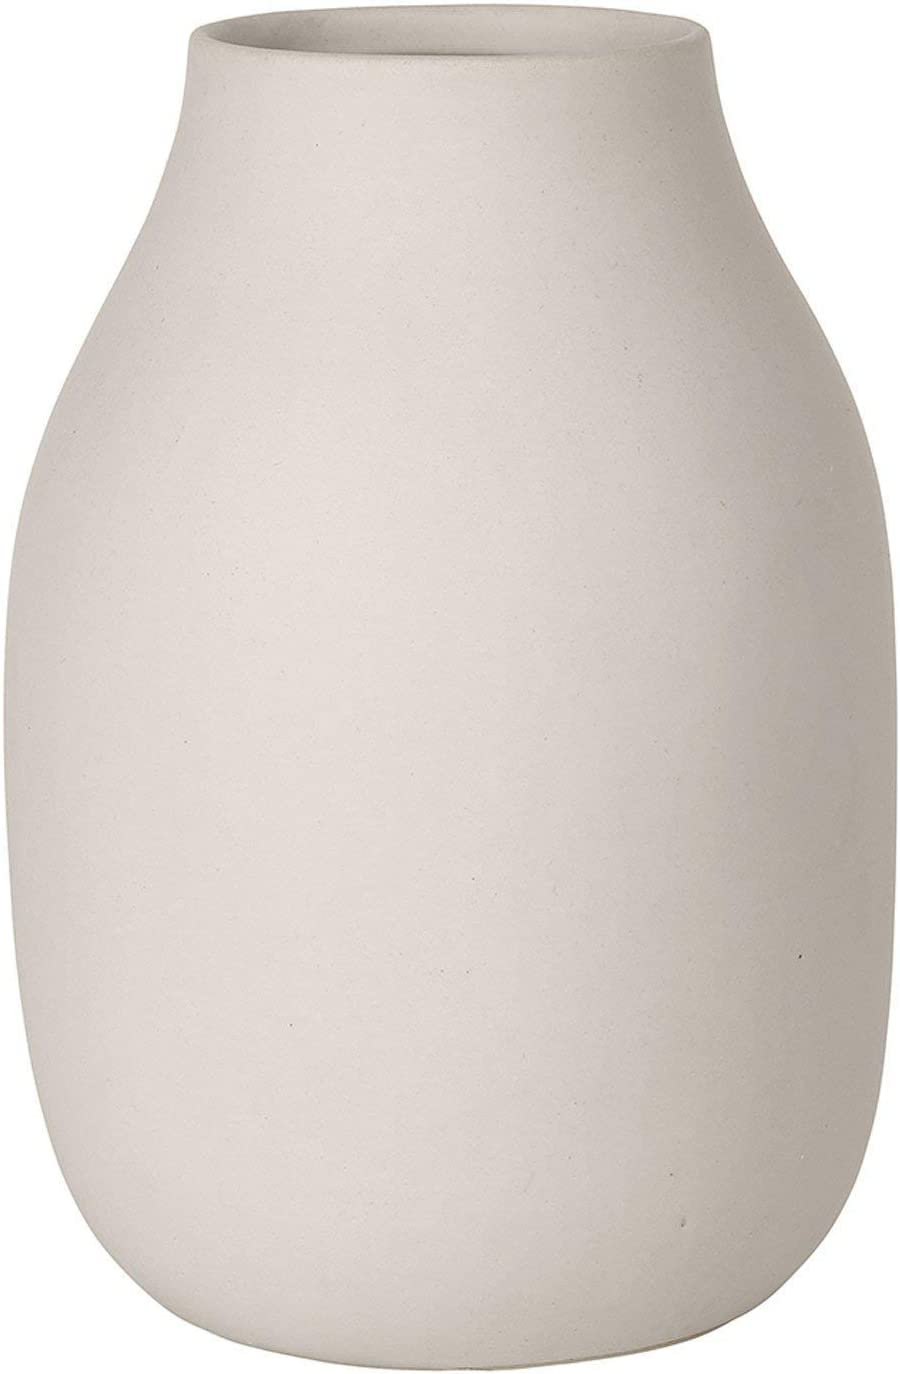 blomus COLORA Free shipping on posting reviews Vase Porcelain 20 Moonbeam Beige x cm Denver Mall 14